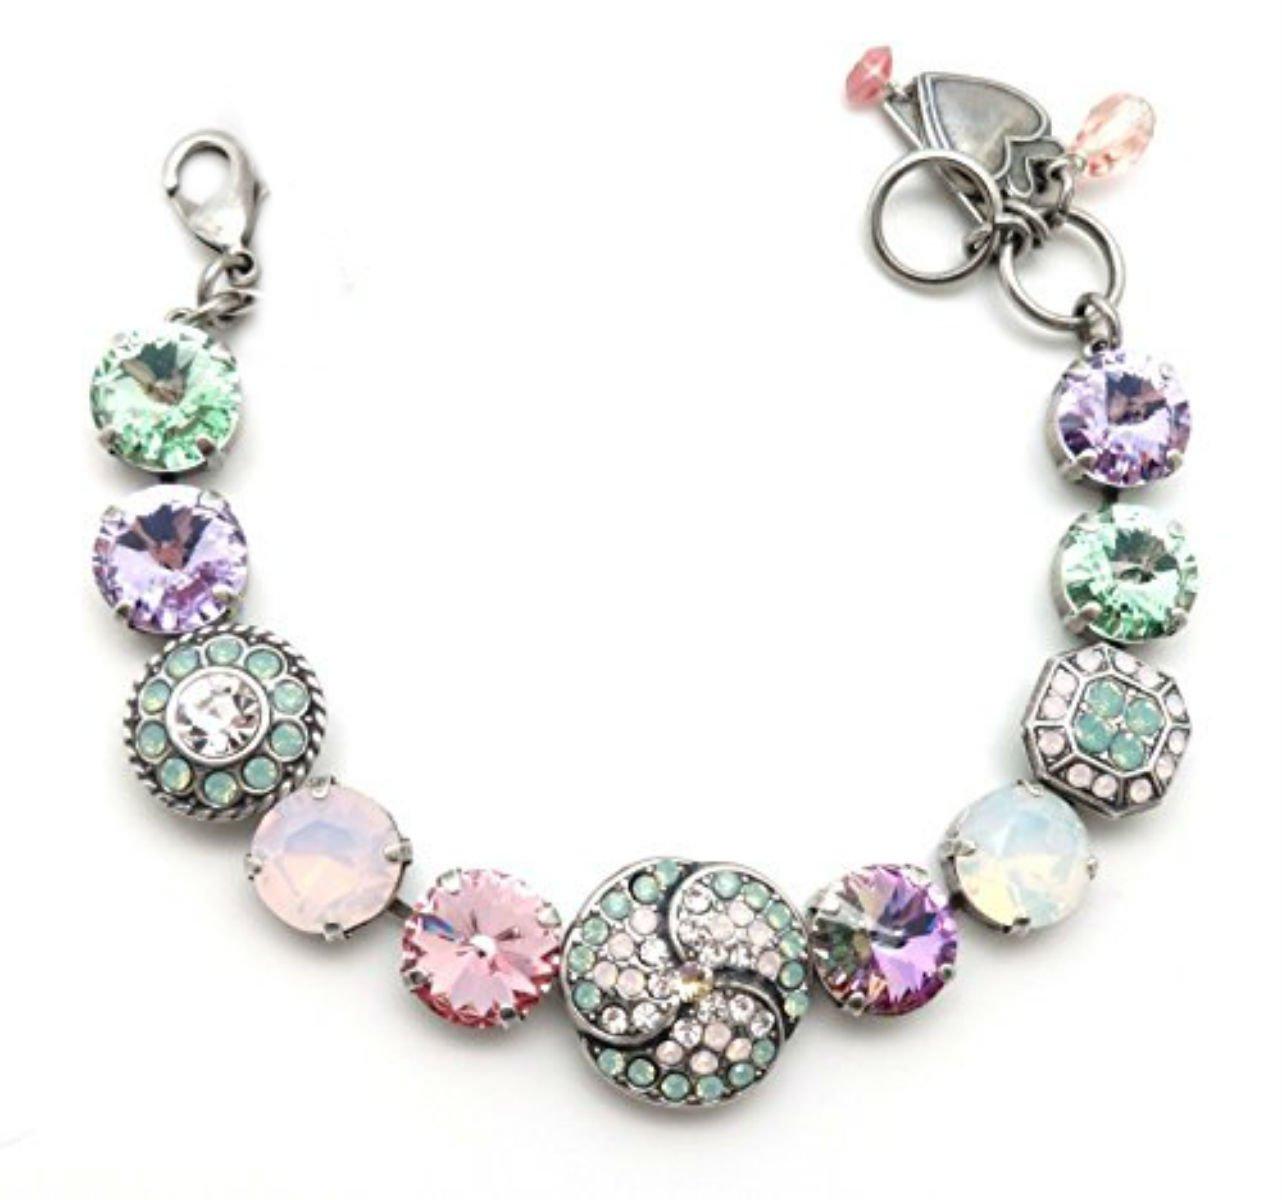 Mariana Silver Plated Swarovski Crystal Bracelet Green & Pink Rivoli Mosaic 1063 Pina Colada